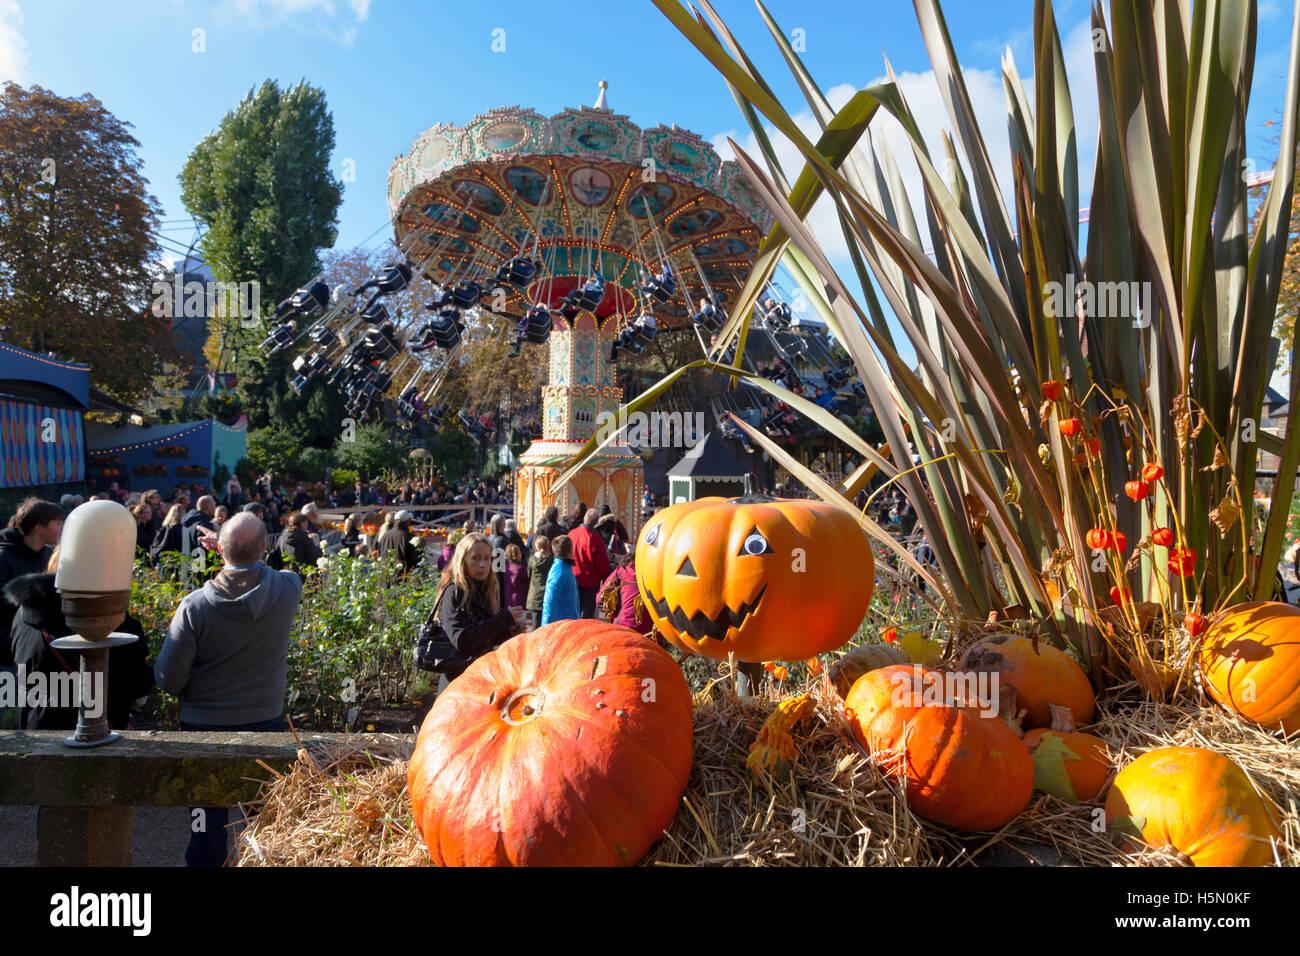 Halloween Pumpkin Installation In The Crowded Tivoli Gardens Stock